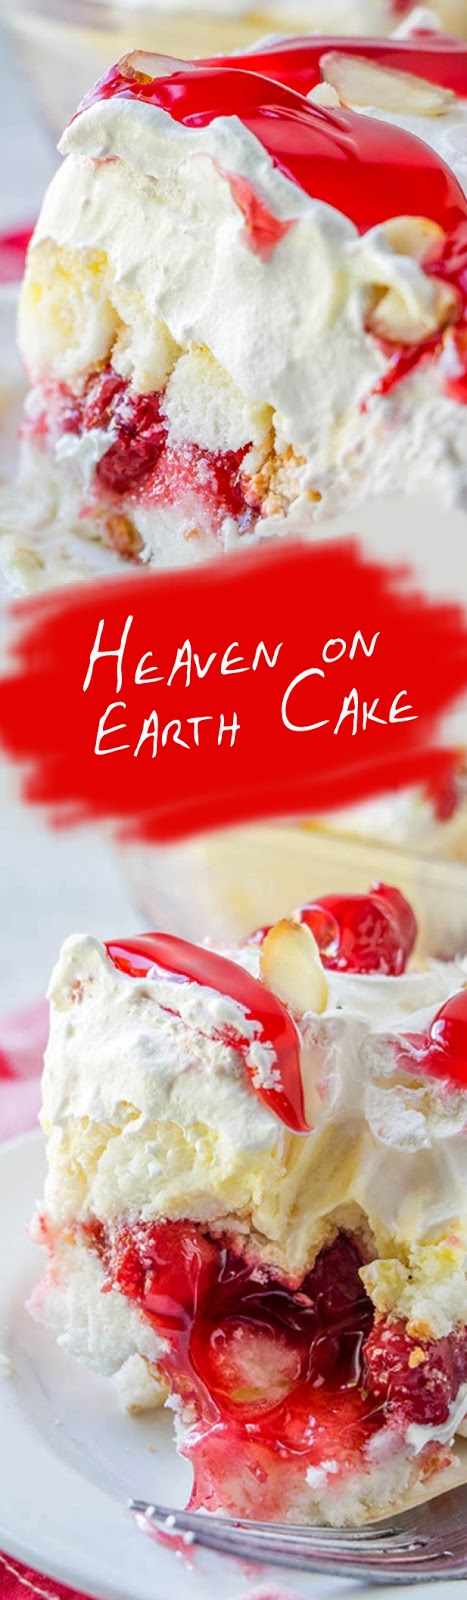 Recipe Heaven on Earth Cake